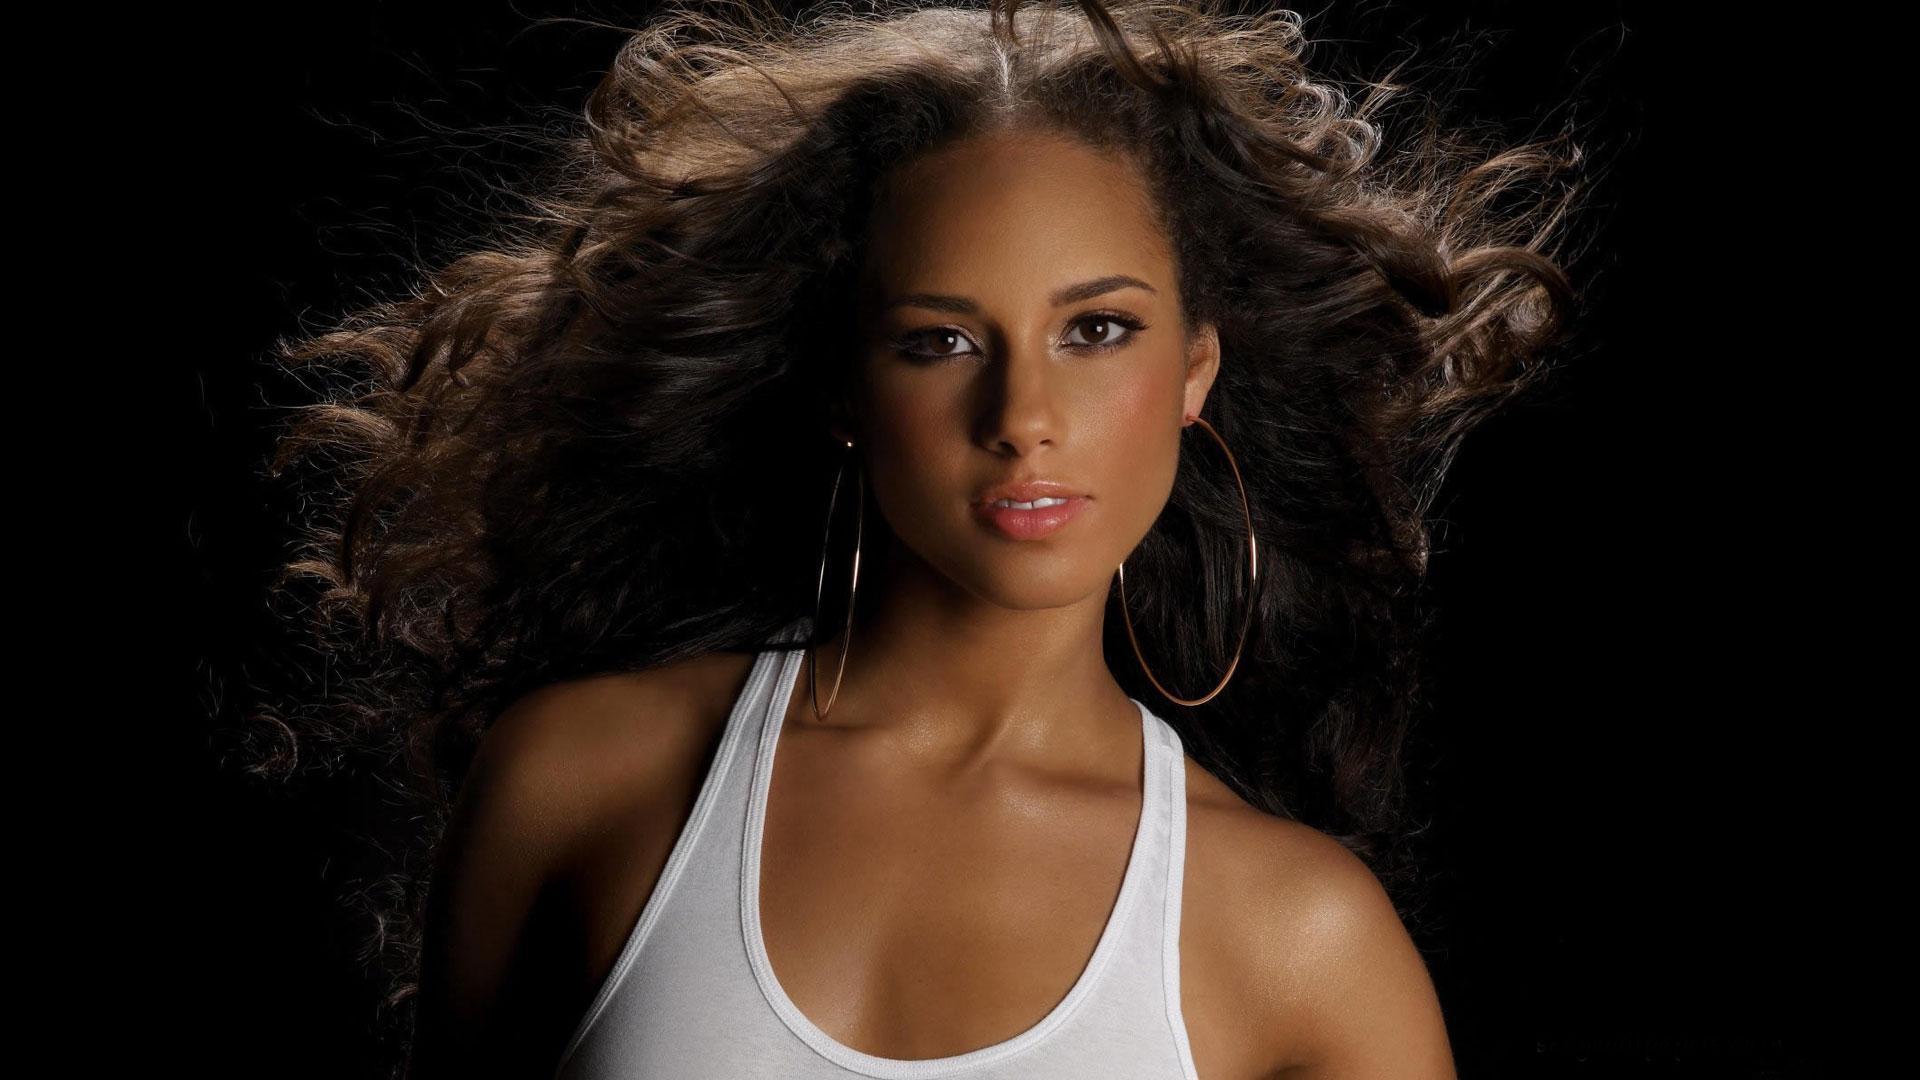 Girl On Fire av Alicia Keys